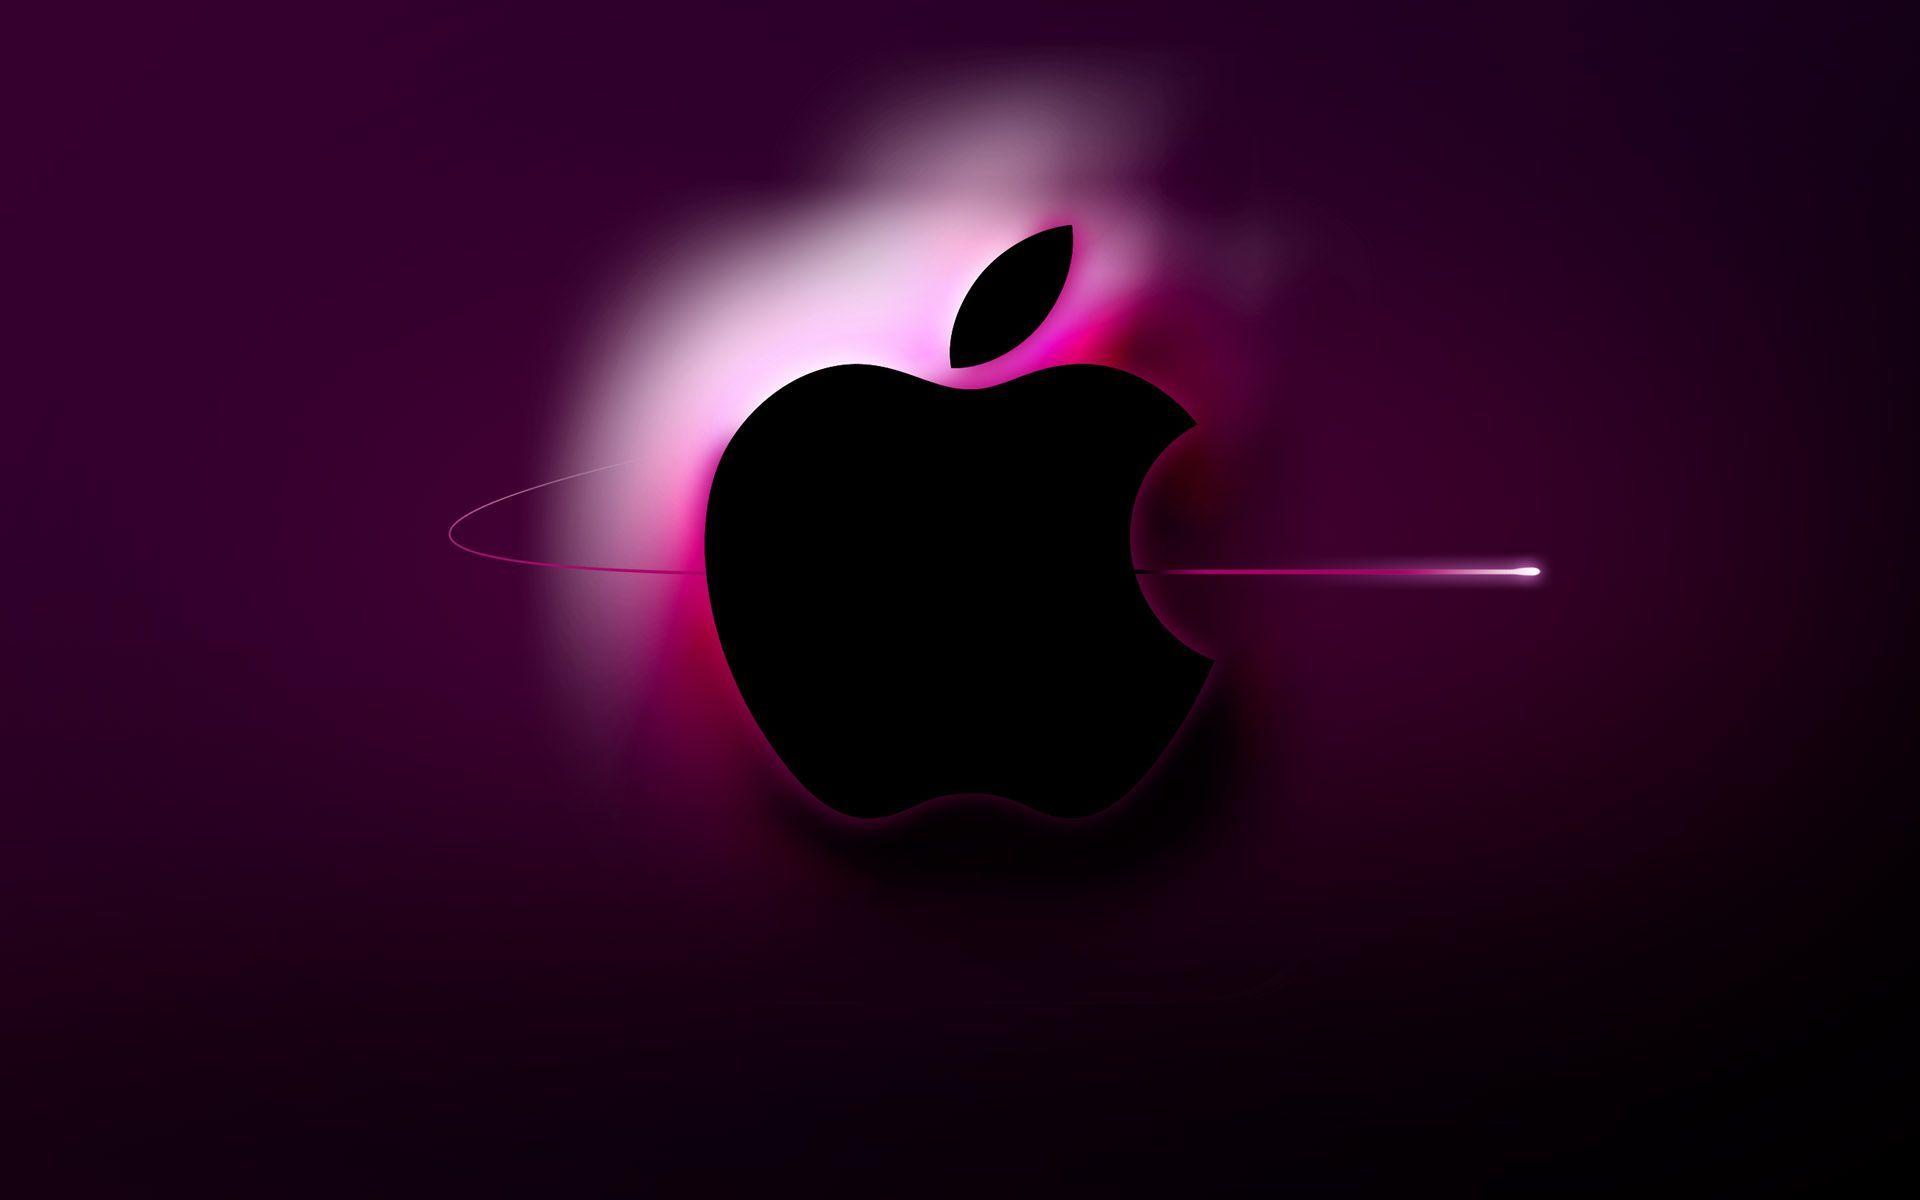 hd apple wallpaper 20485 - desktop wallpapers - system wallpaper